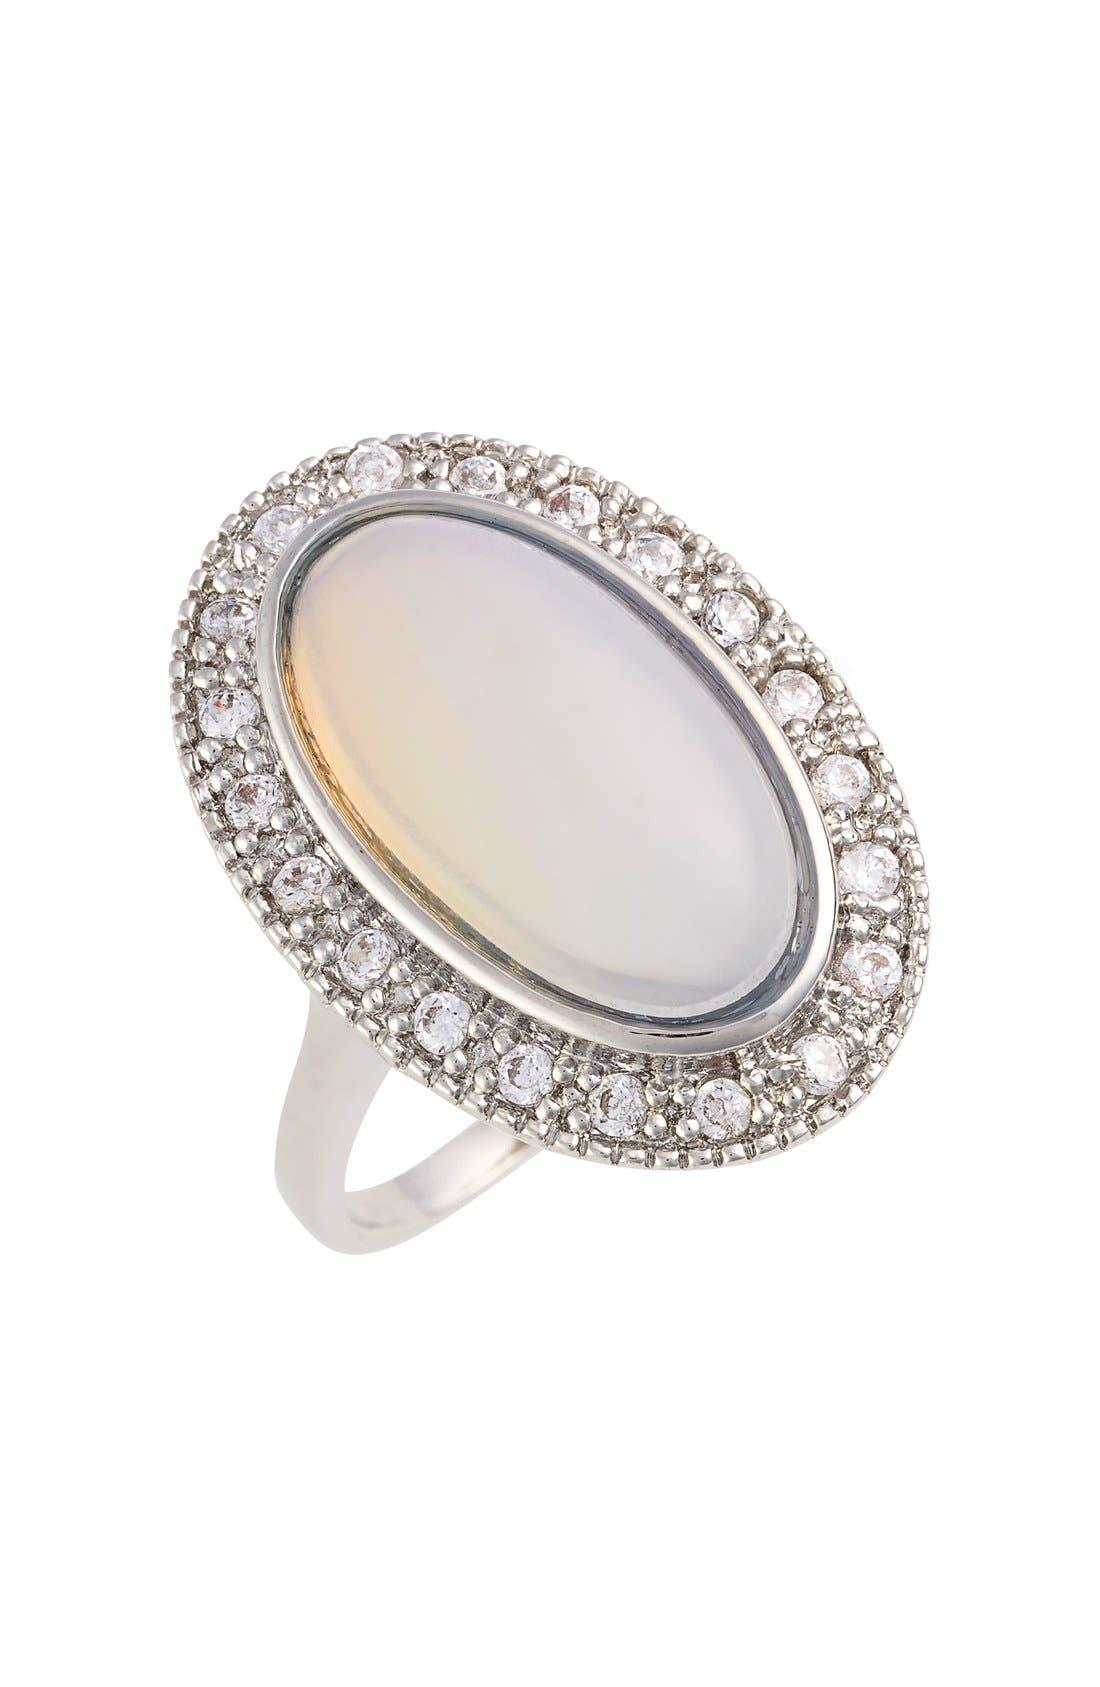 Main Image - Samantha Wills 'Fields of Gold' Ring